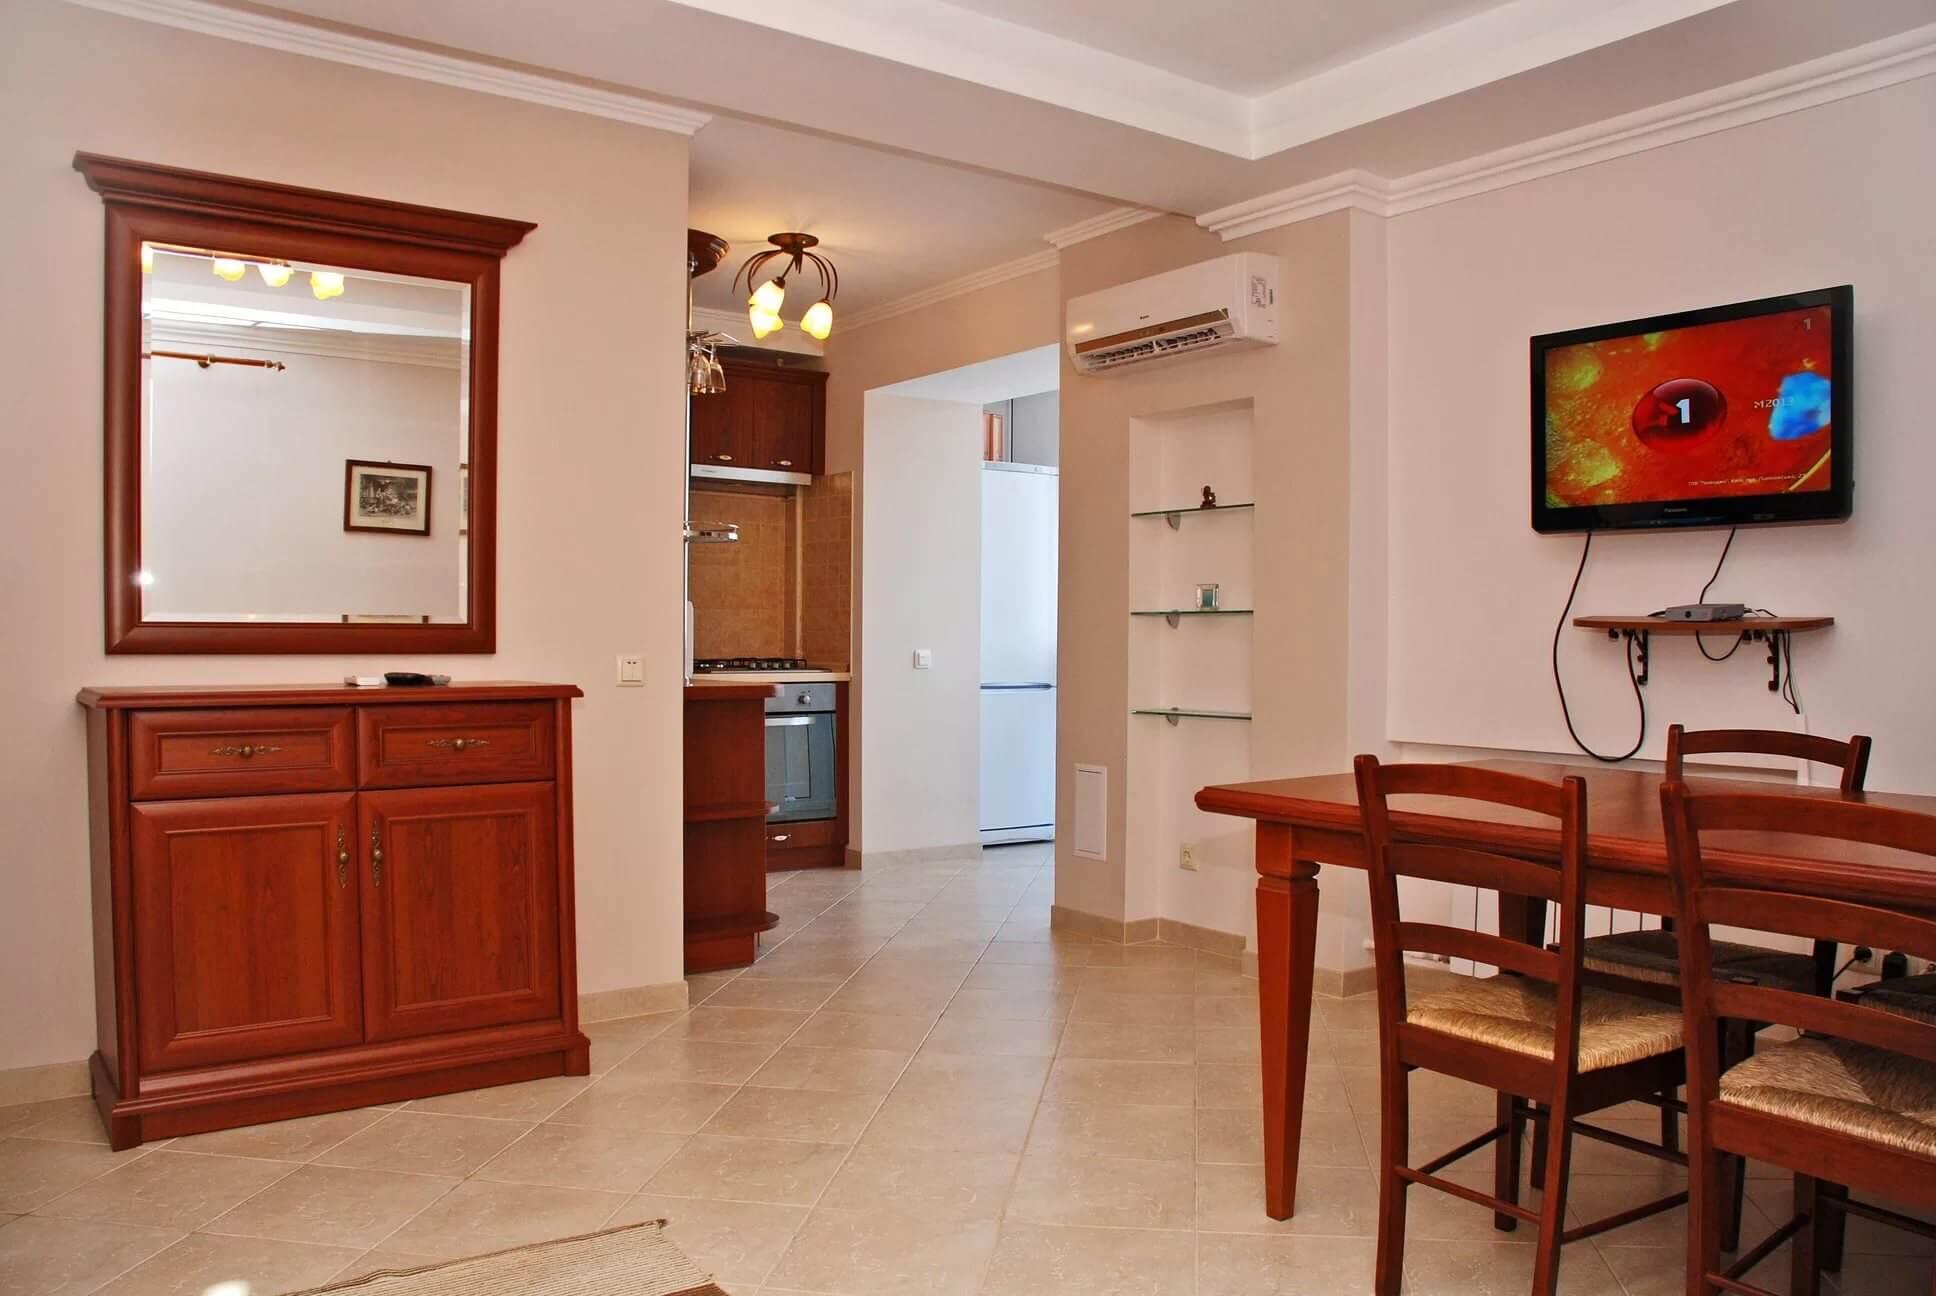 Стол, стулья, телевизор, шкафчик с зеркалом в квартире